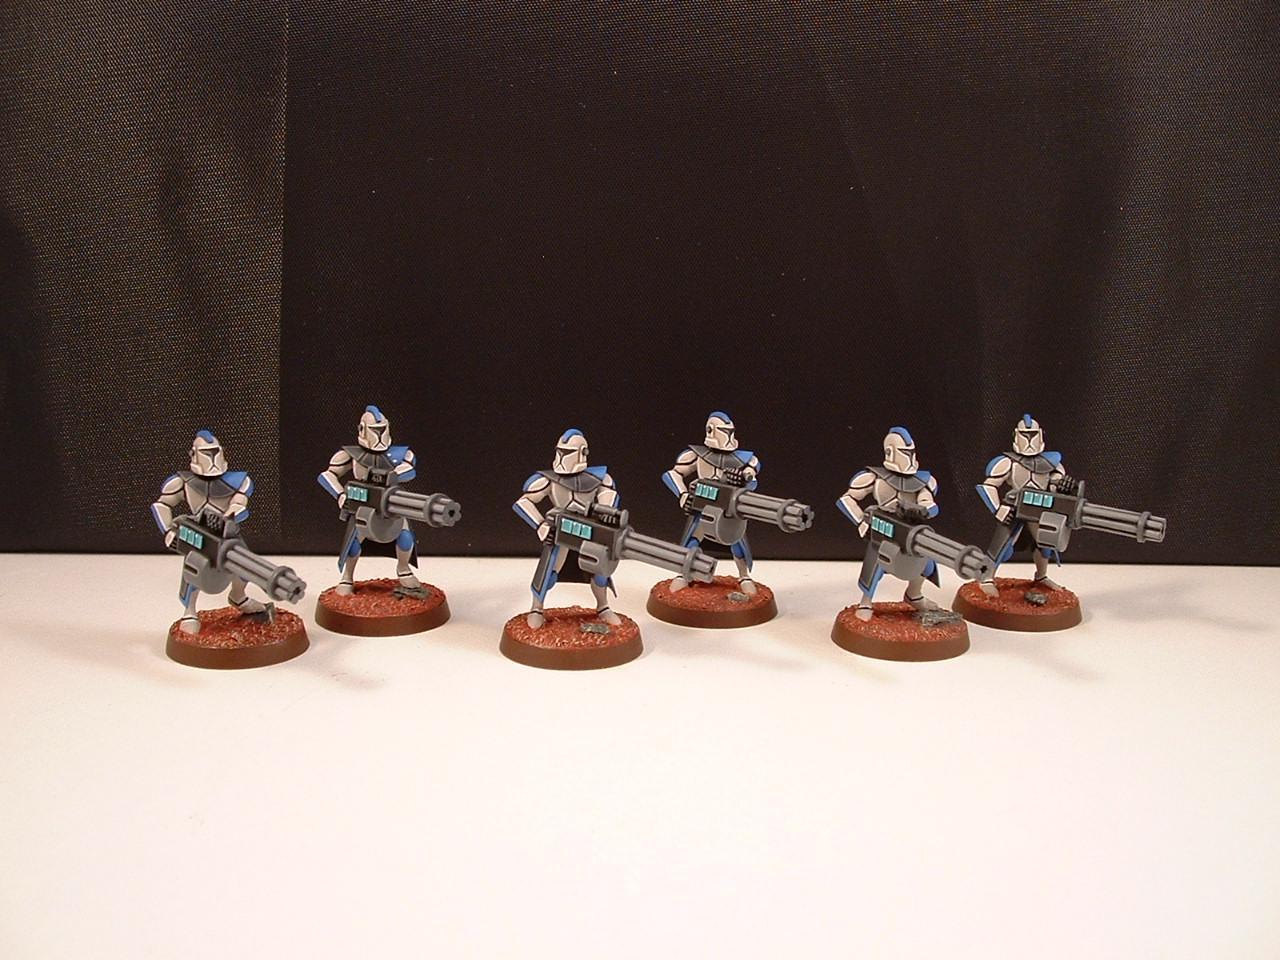 Clone Troopers, Clone Wars, Homebrew, Scratch Build, Star Wars